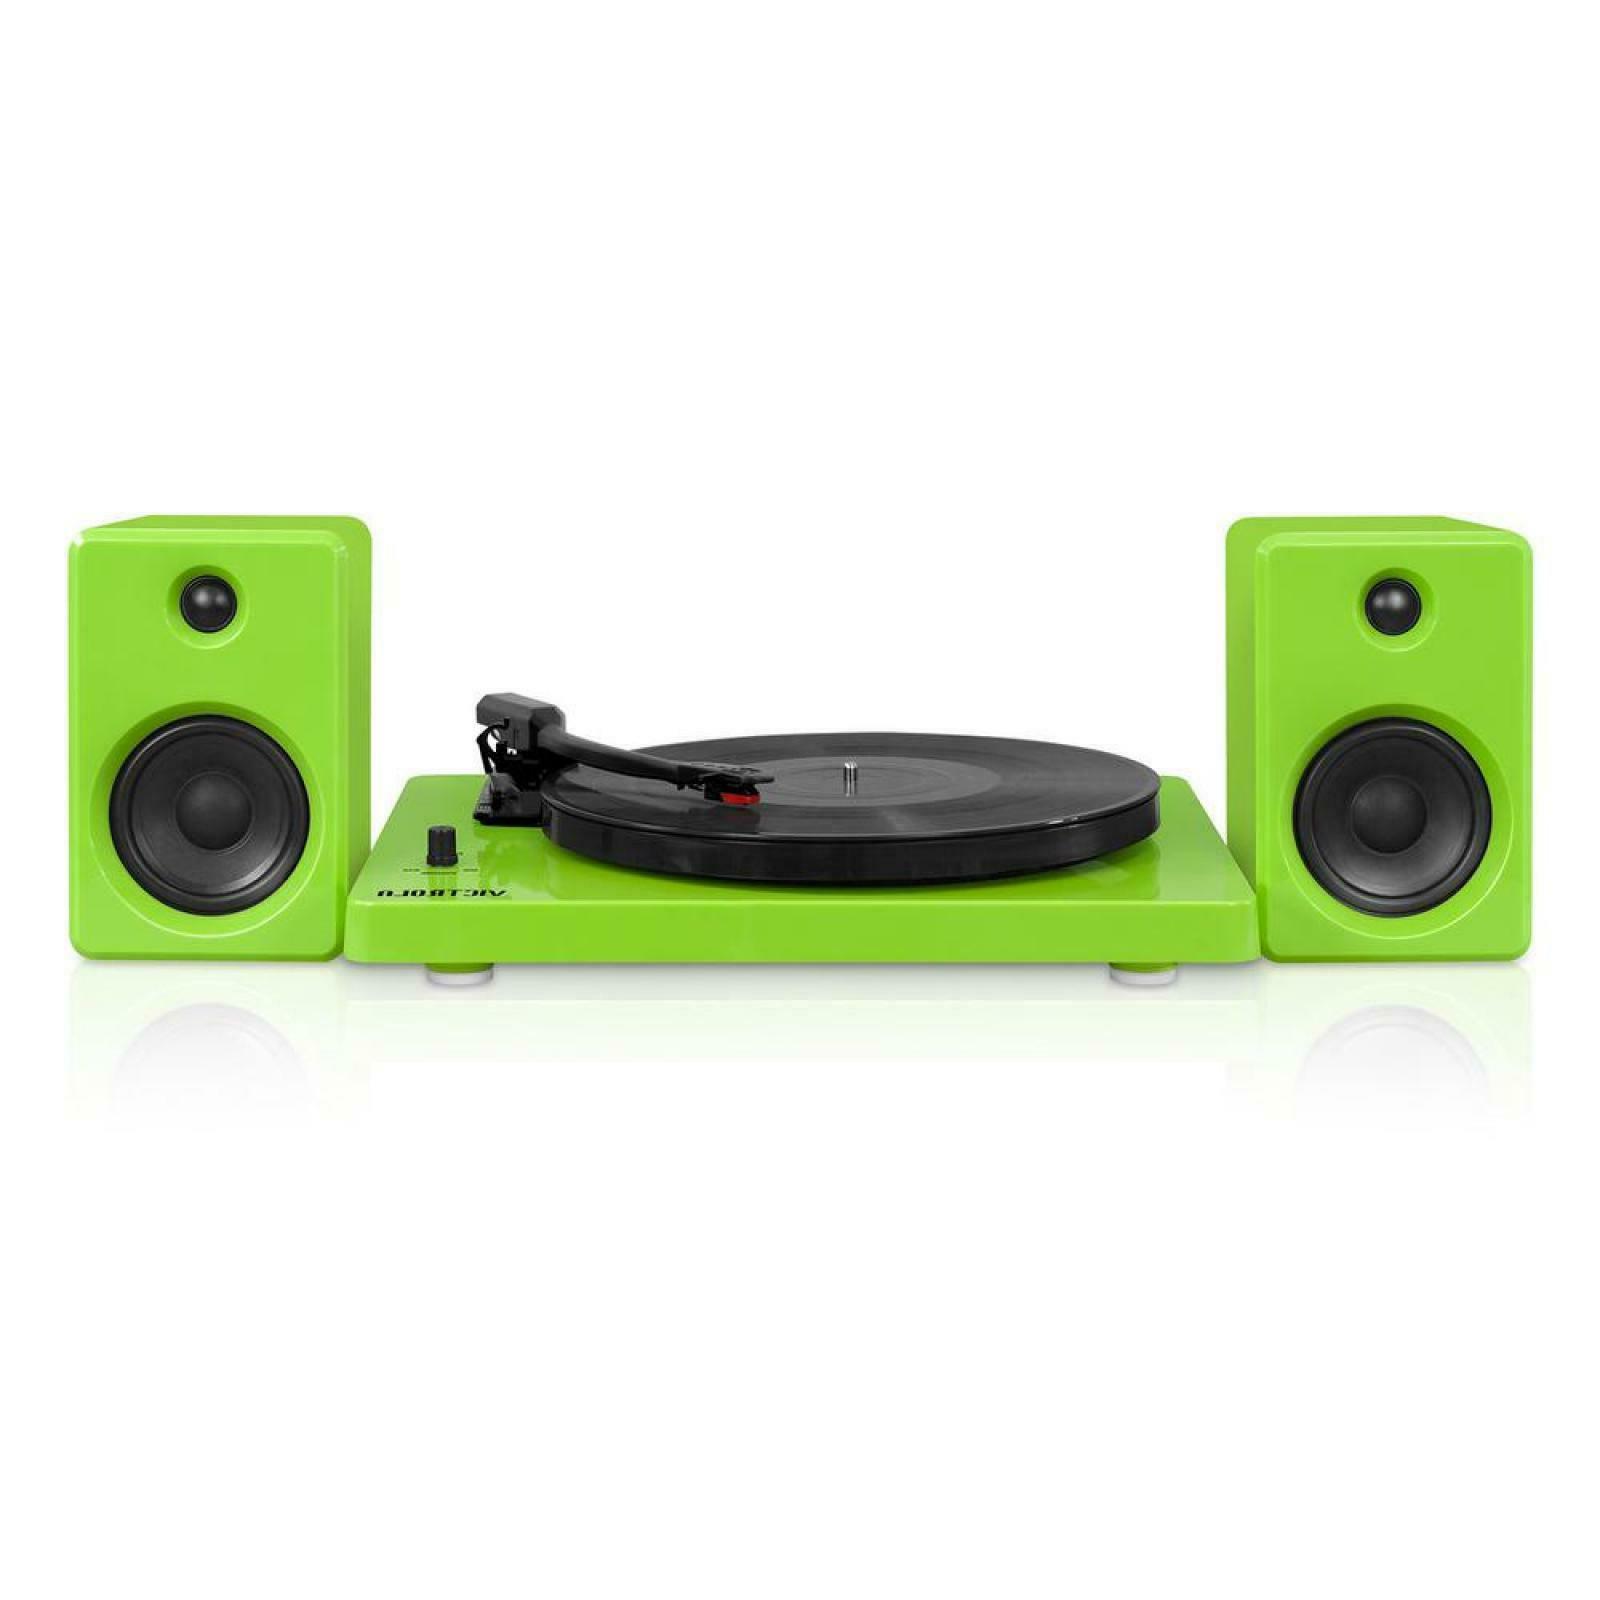 Green Vinyl Record Player 3-Speed Turntable Bluetooth 50W Au